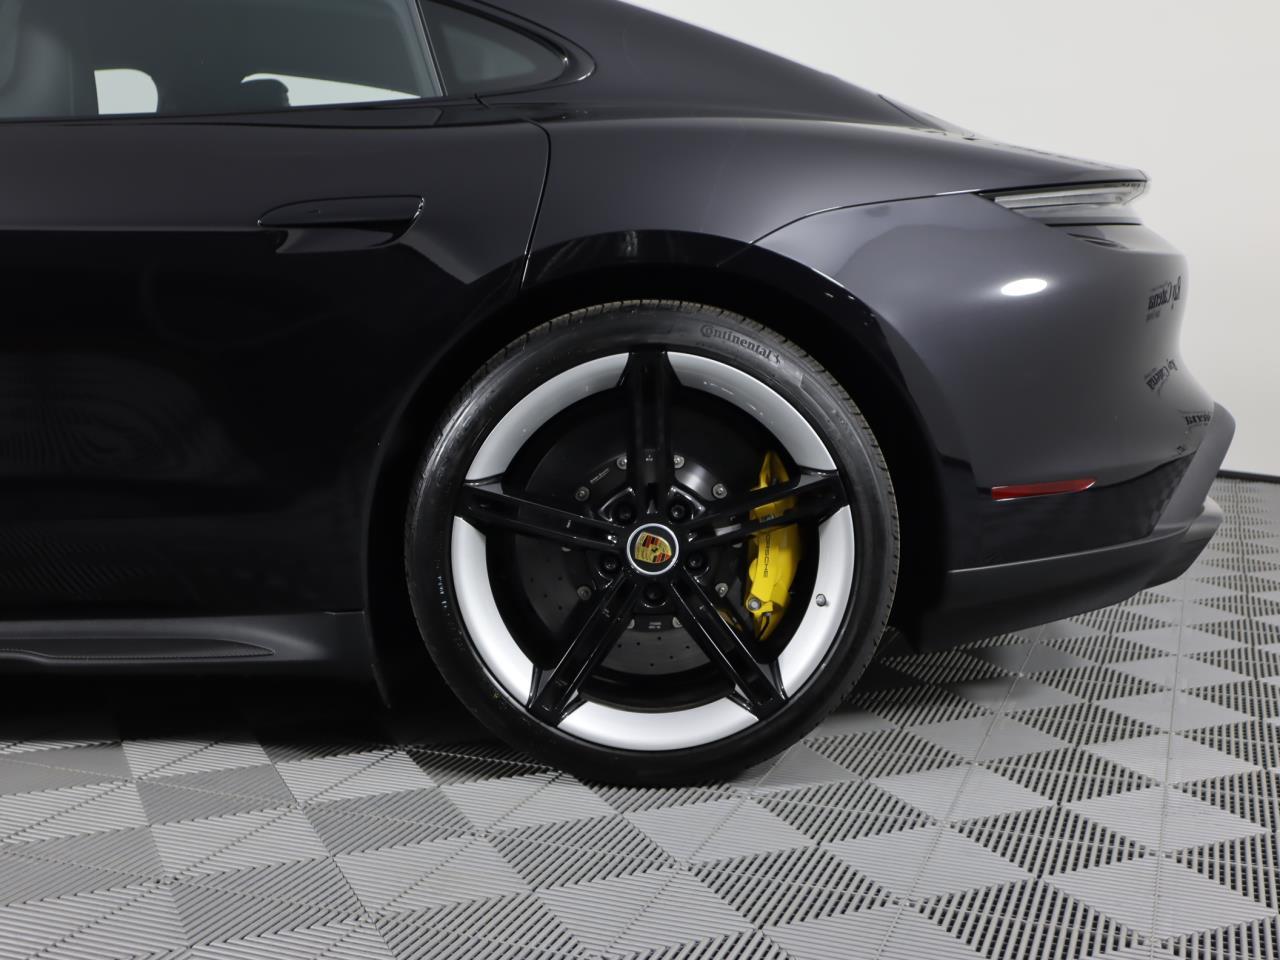 New 2021 Porsche Taycan Turbo S